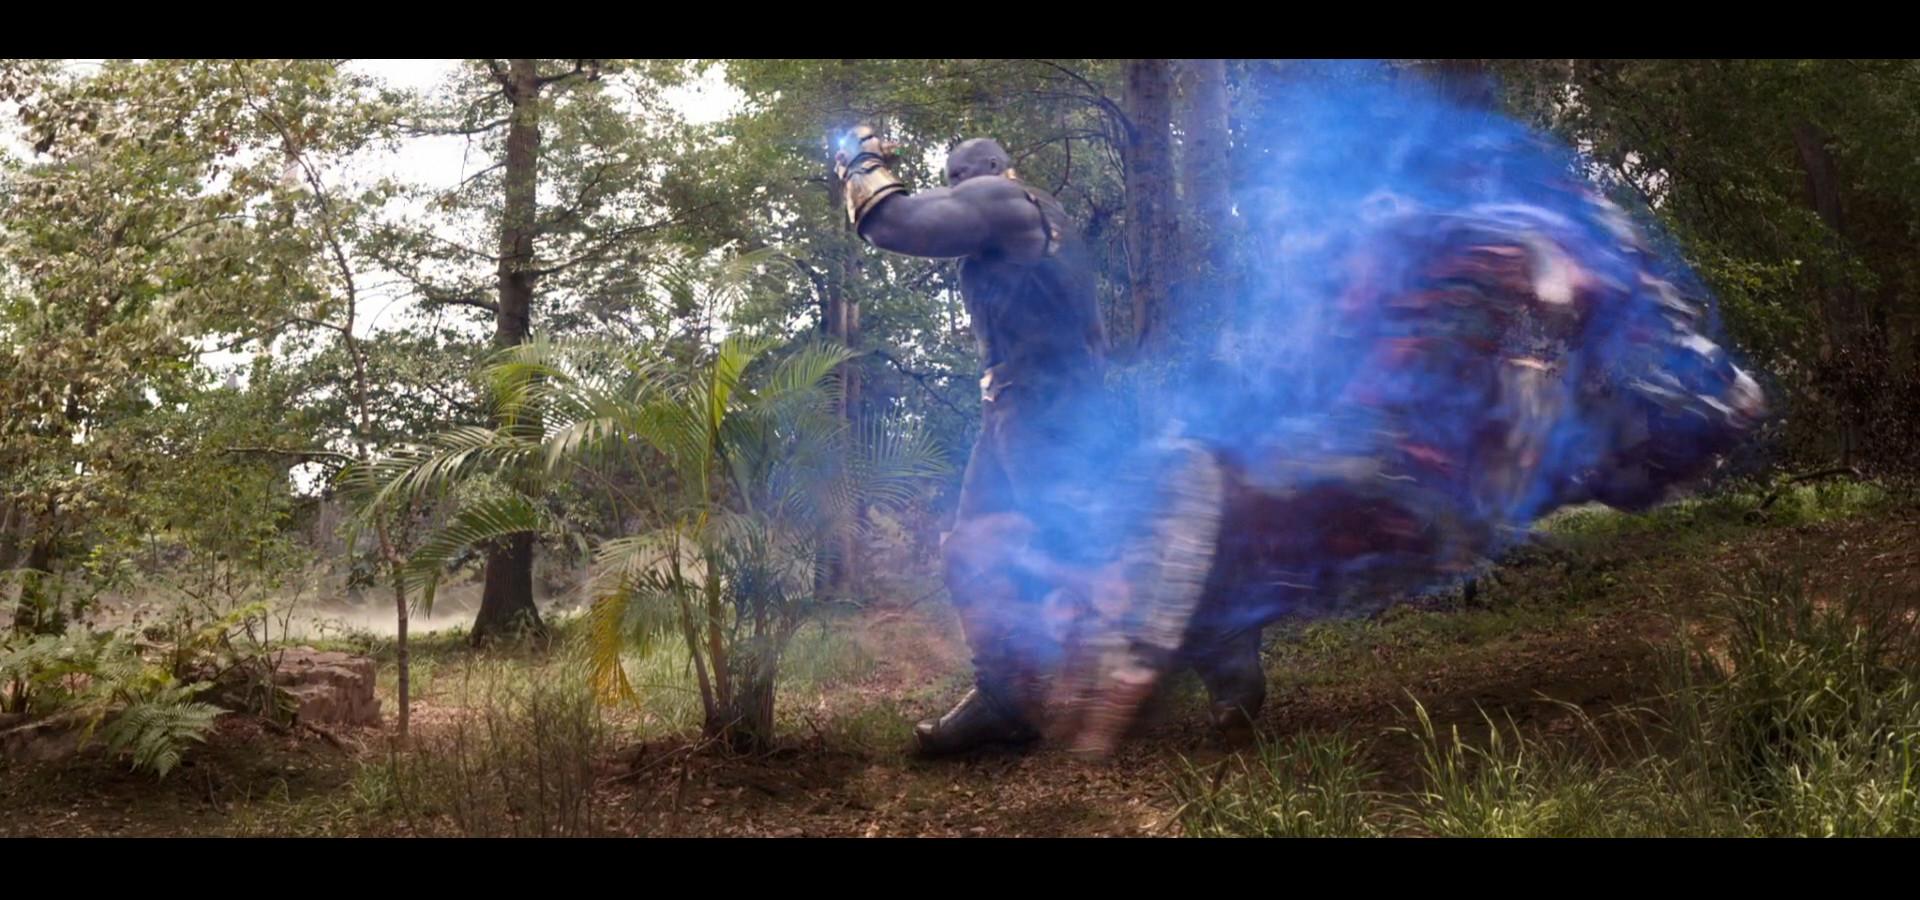 Scott knapp avengers screenshots 023